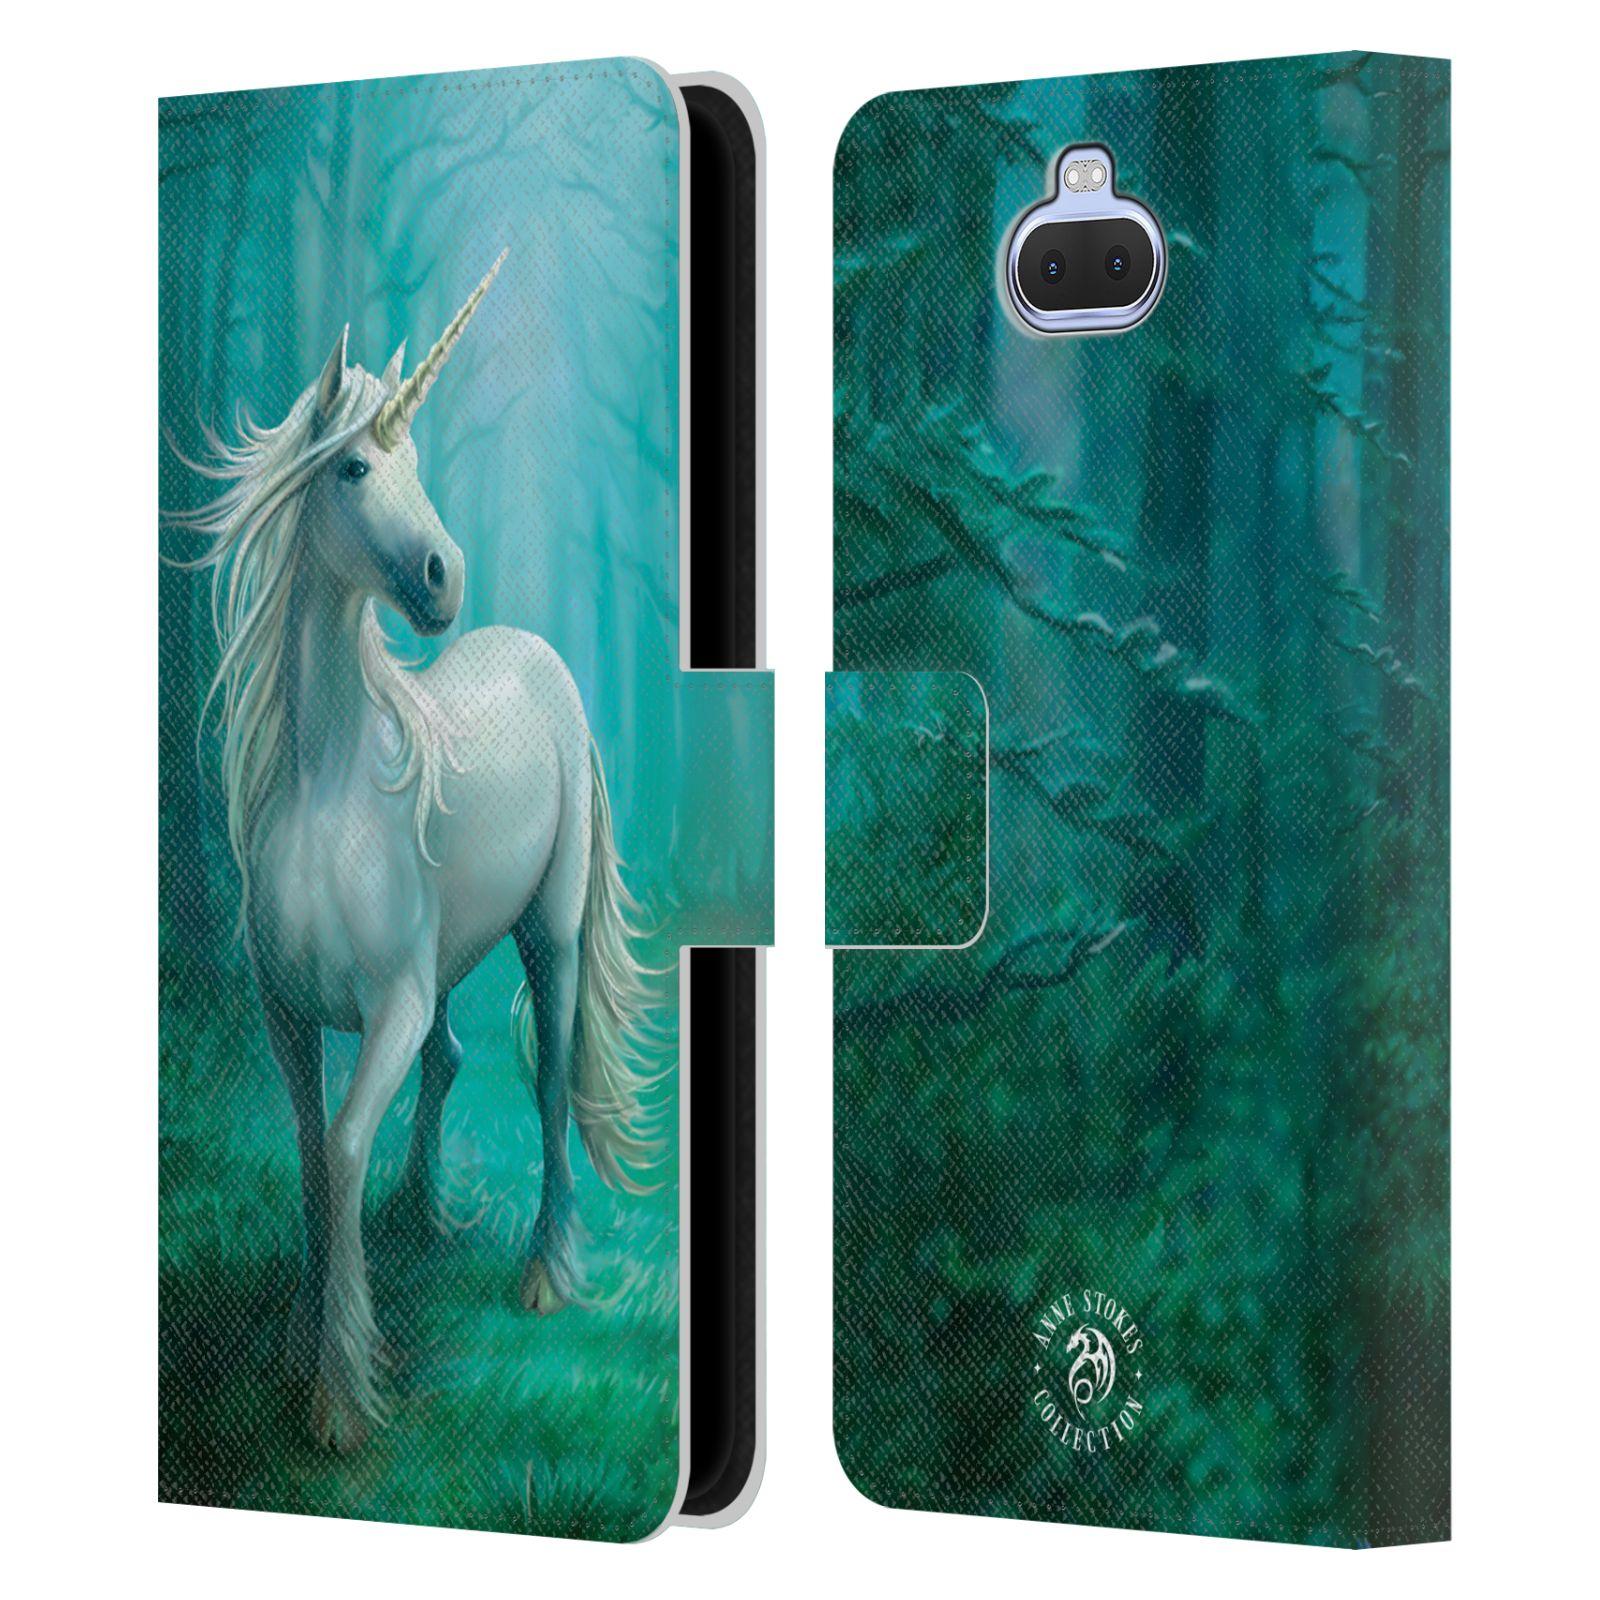 Pouzdro na mobil Sony Xperia 10 - Head Case - fantasy - jednorožec v lese